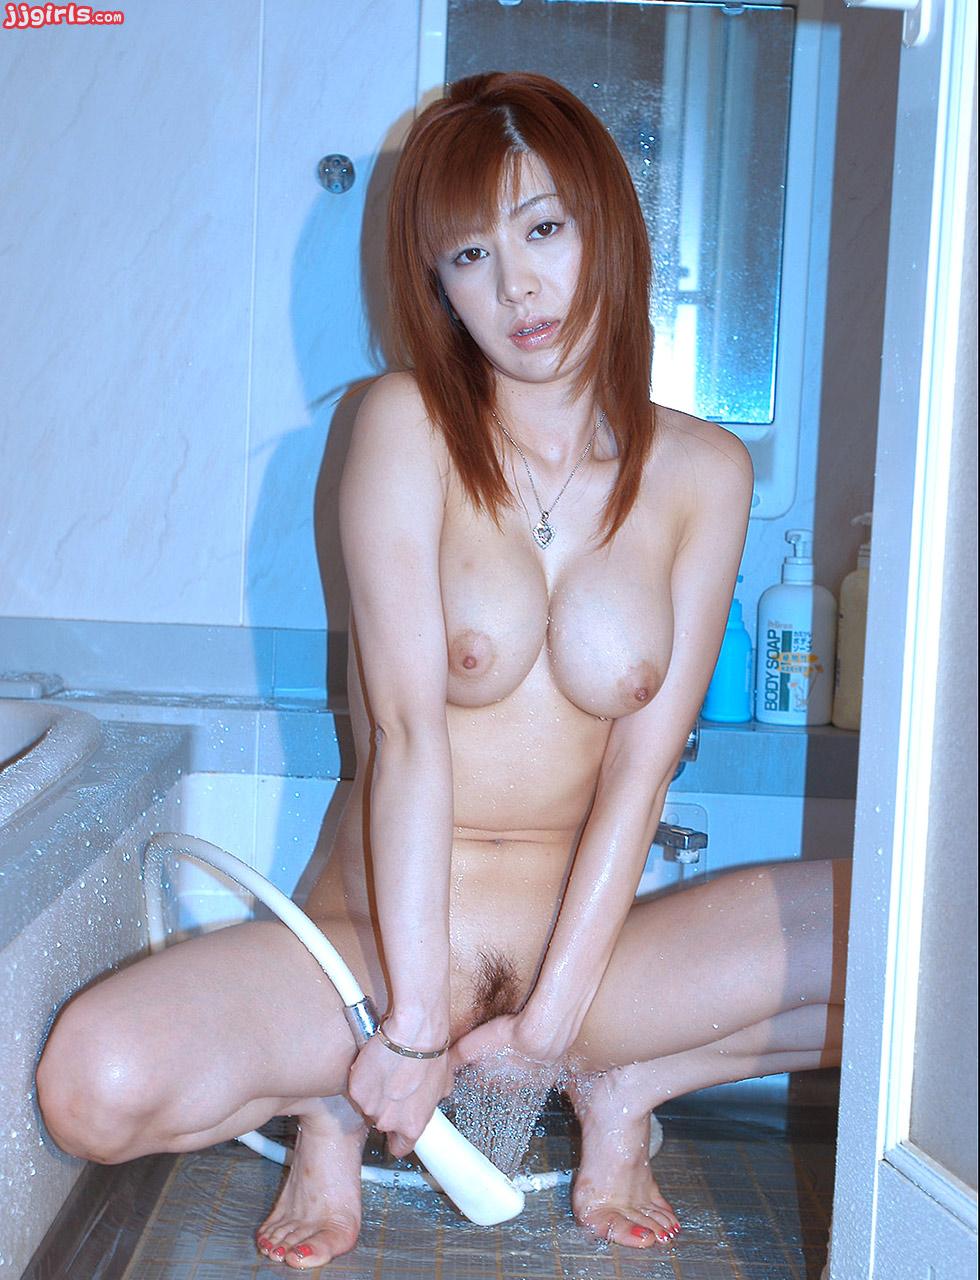 tokyo-hot  reimi ksnoh pussy Reimi Kanoh ...